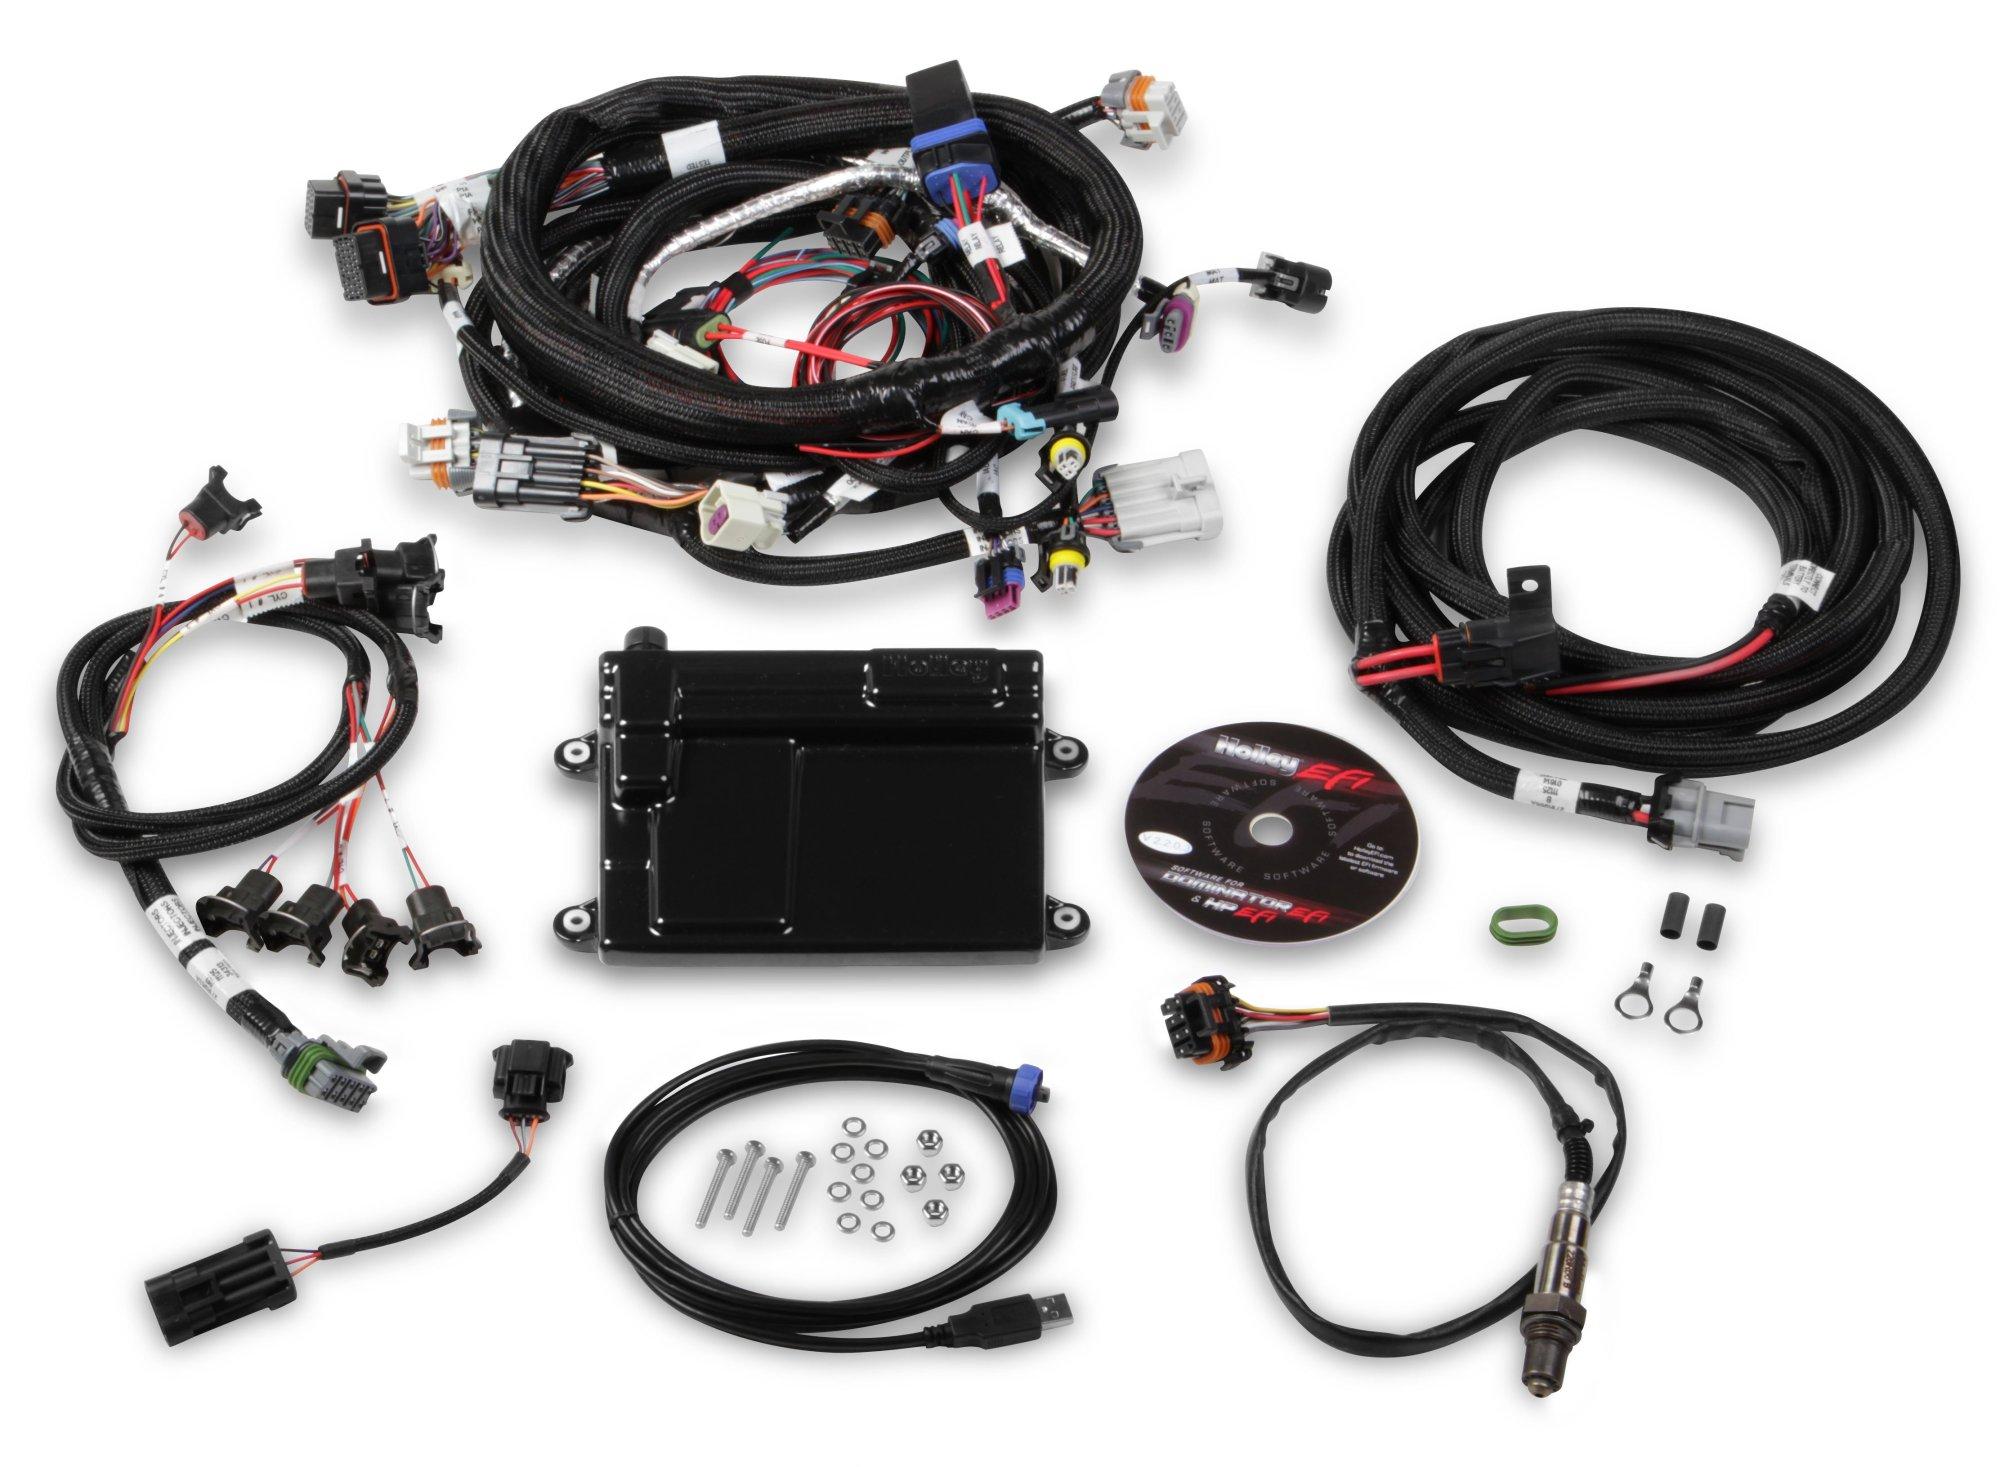 hight resolution of hp efi ecu harness kits